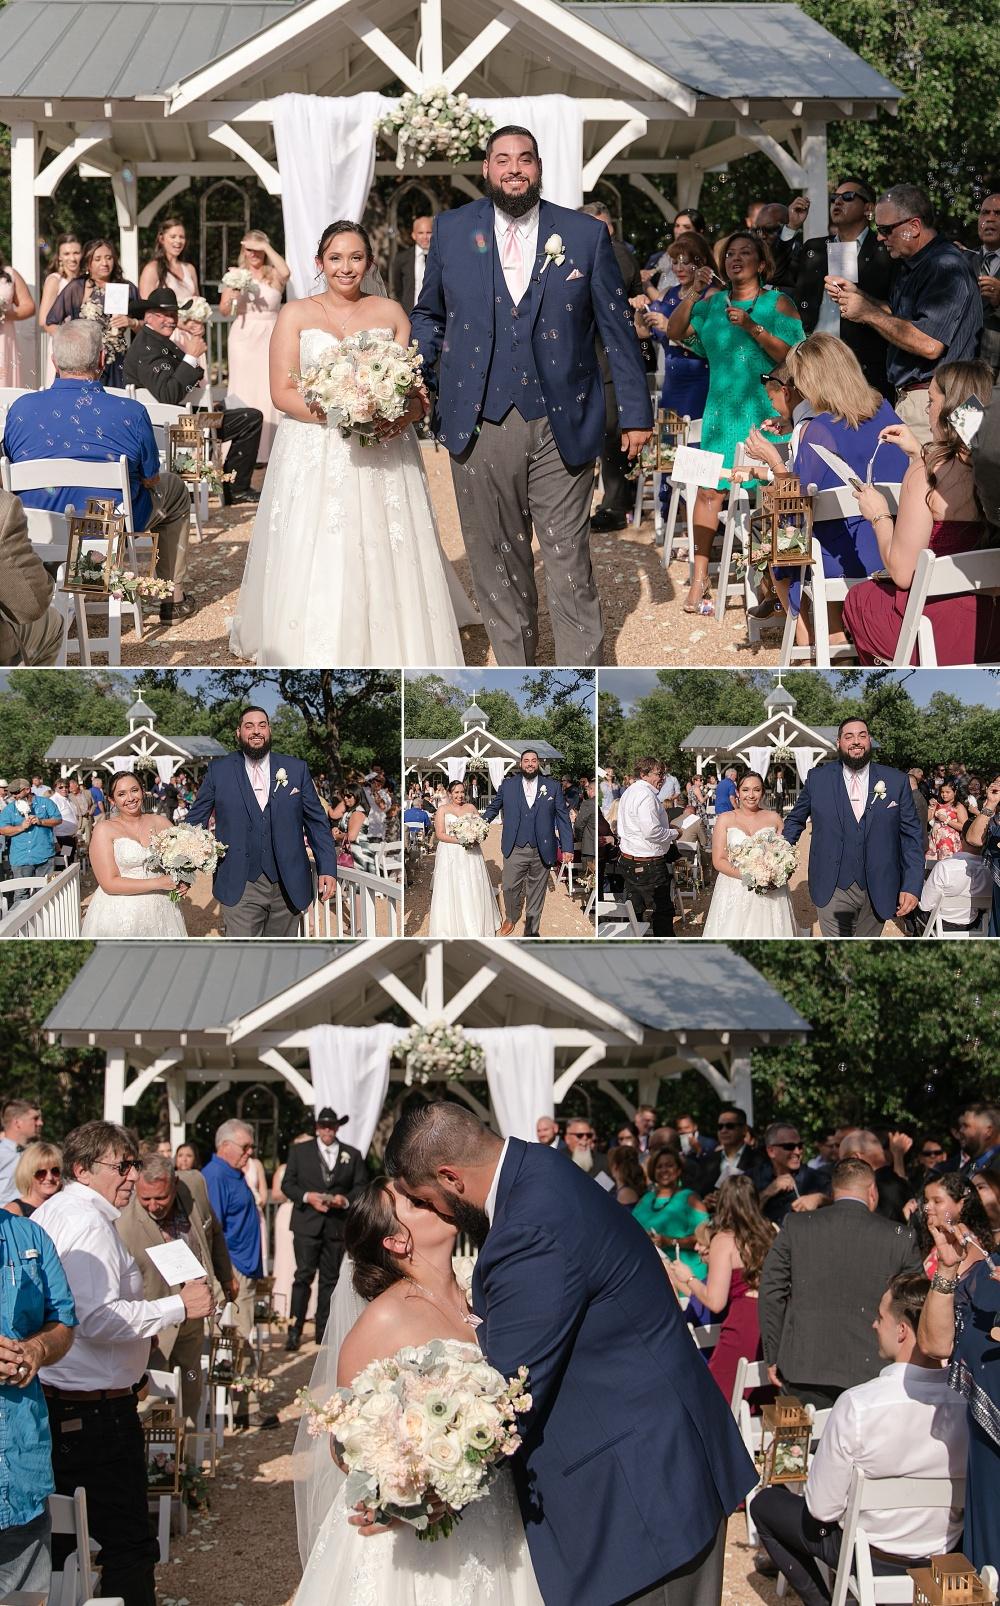 Wedding-Photographer-Bulverde-Texas-Western-Sky-Event-Venue-Carly-Barton-Photography_0046.jpg